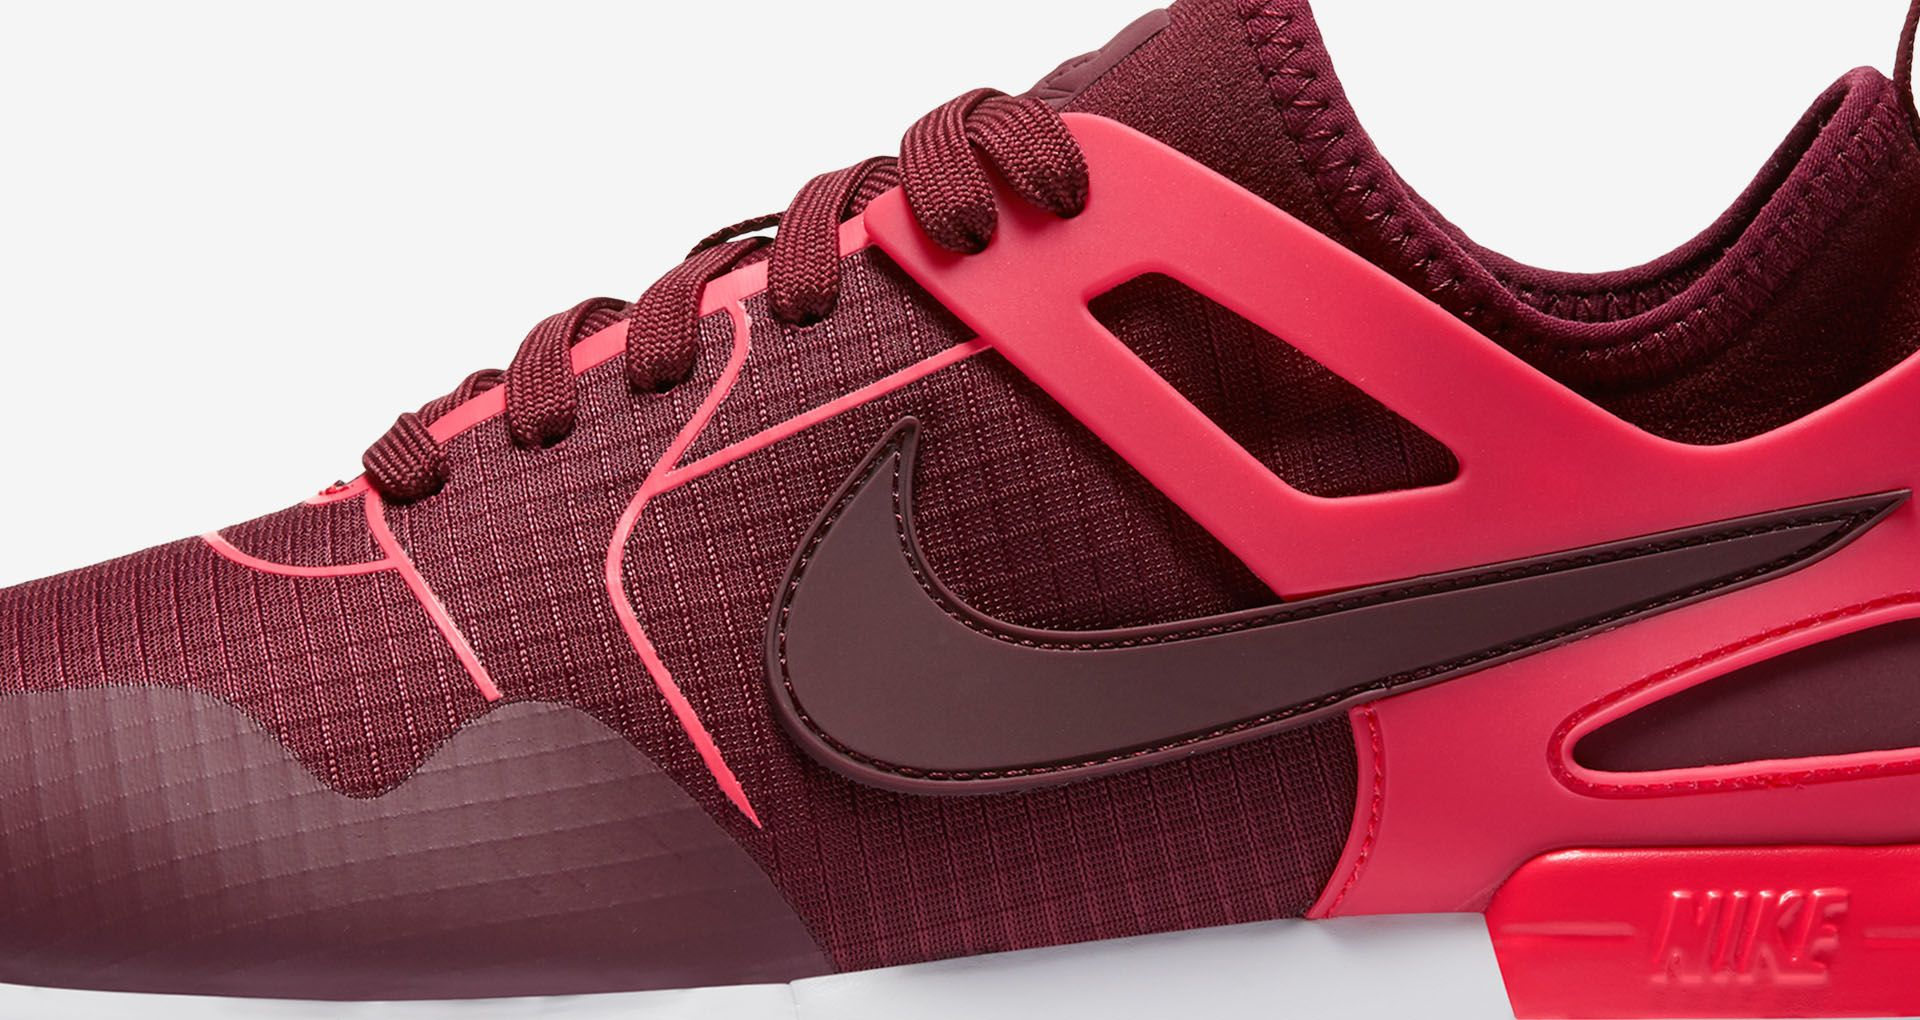 8179d7aca05b4 Nike Air Pegasus 89 Tech  Night Maroon  Release Date. Nike+ SNKRS